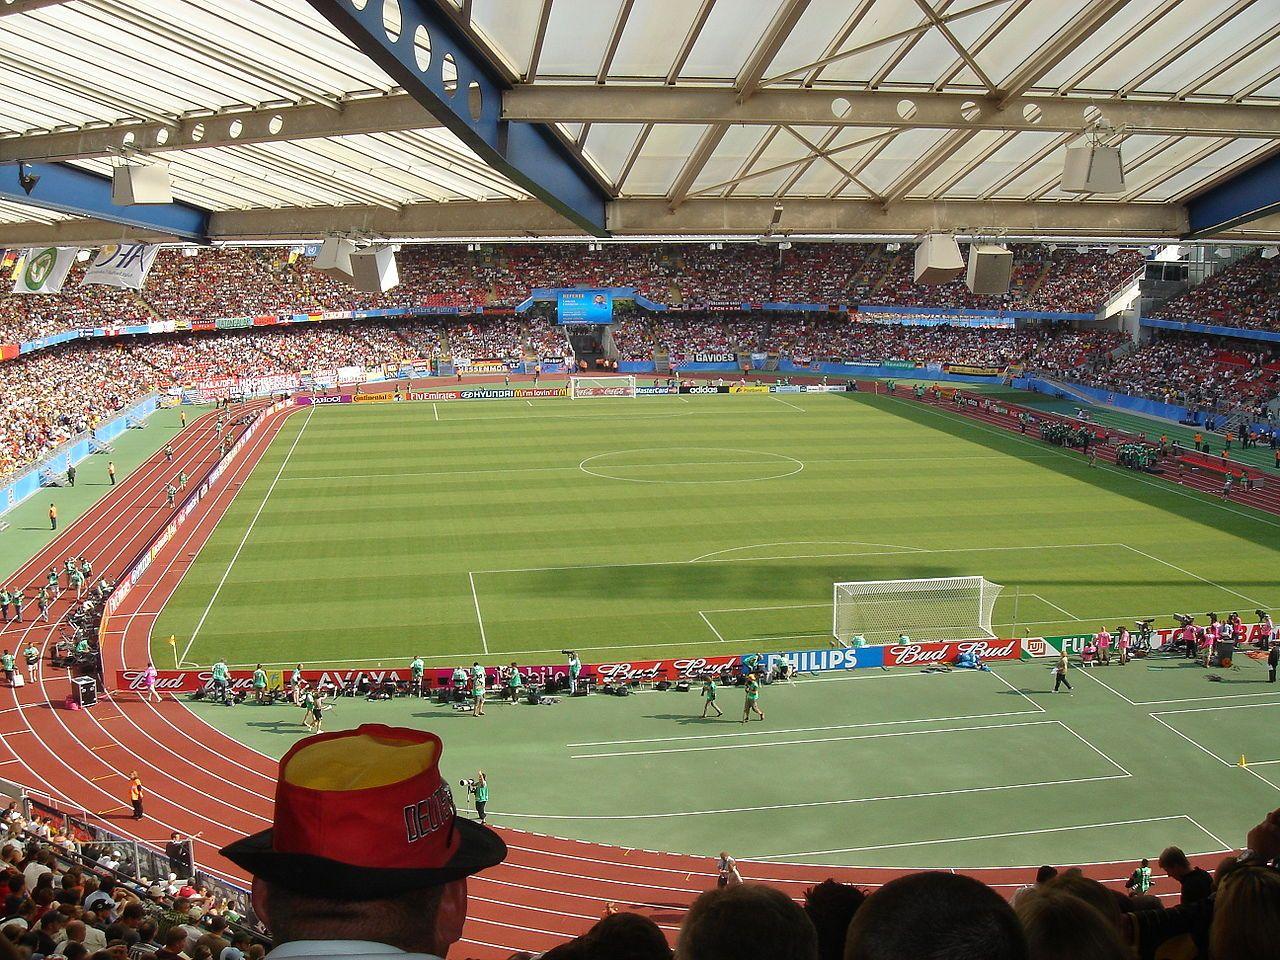 * Grundig Stadion * Capacidade: 48.548 lugares, Mandante: FC Nürnberg. Nuremberg, Alemanha.